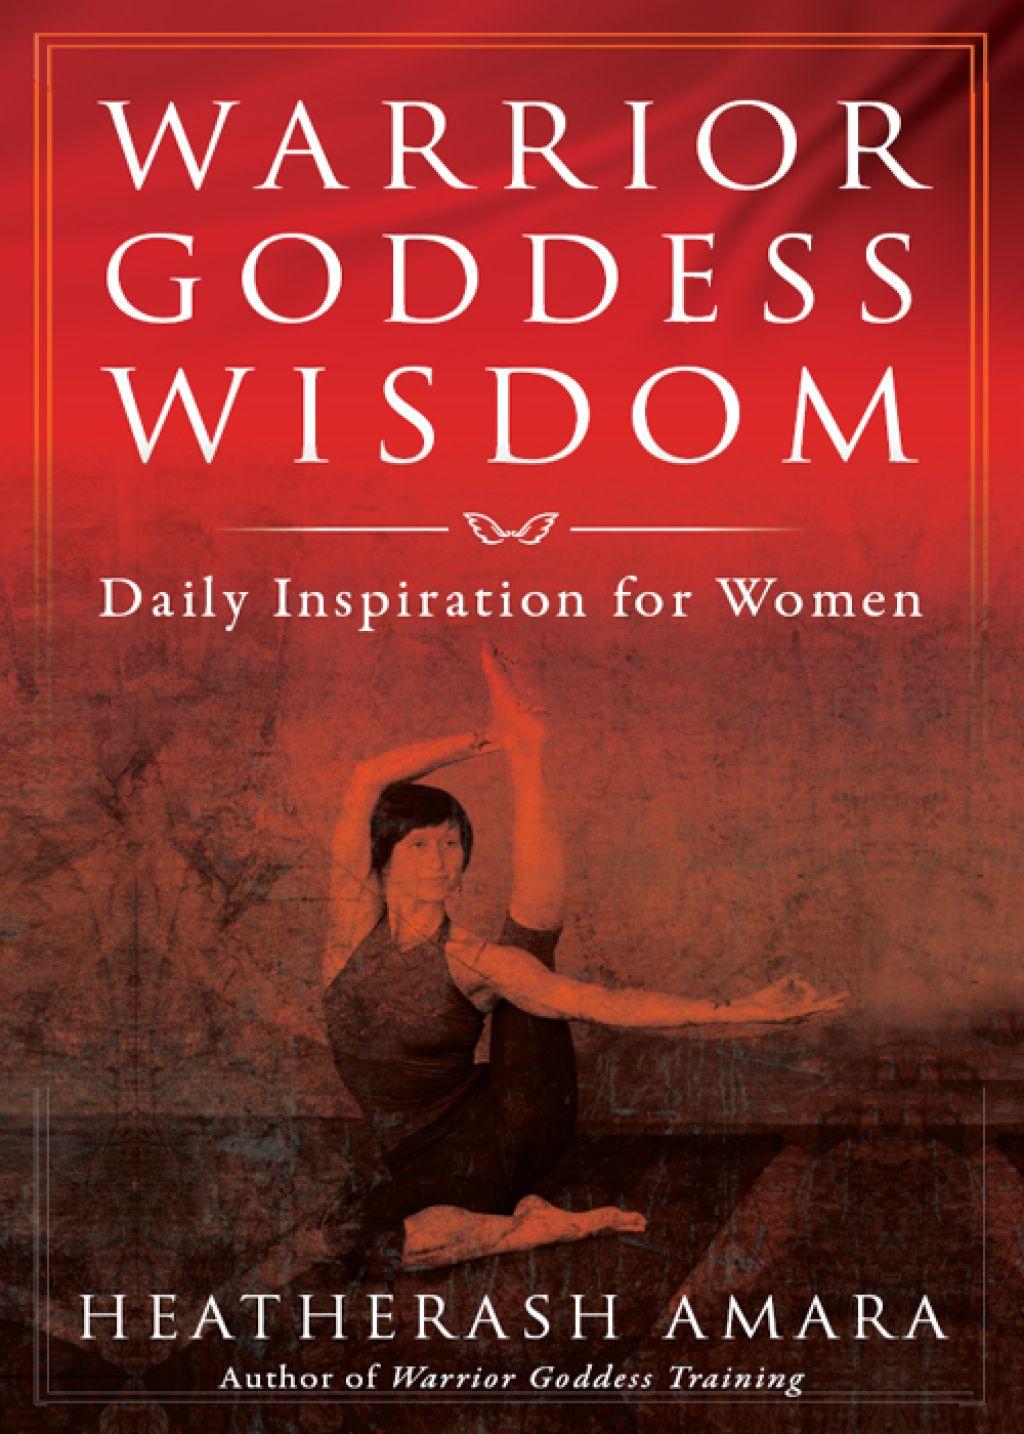 Warrior Goddess Wisdom (eBook)   Products   Warrior goddess training